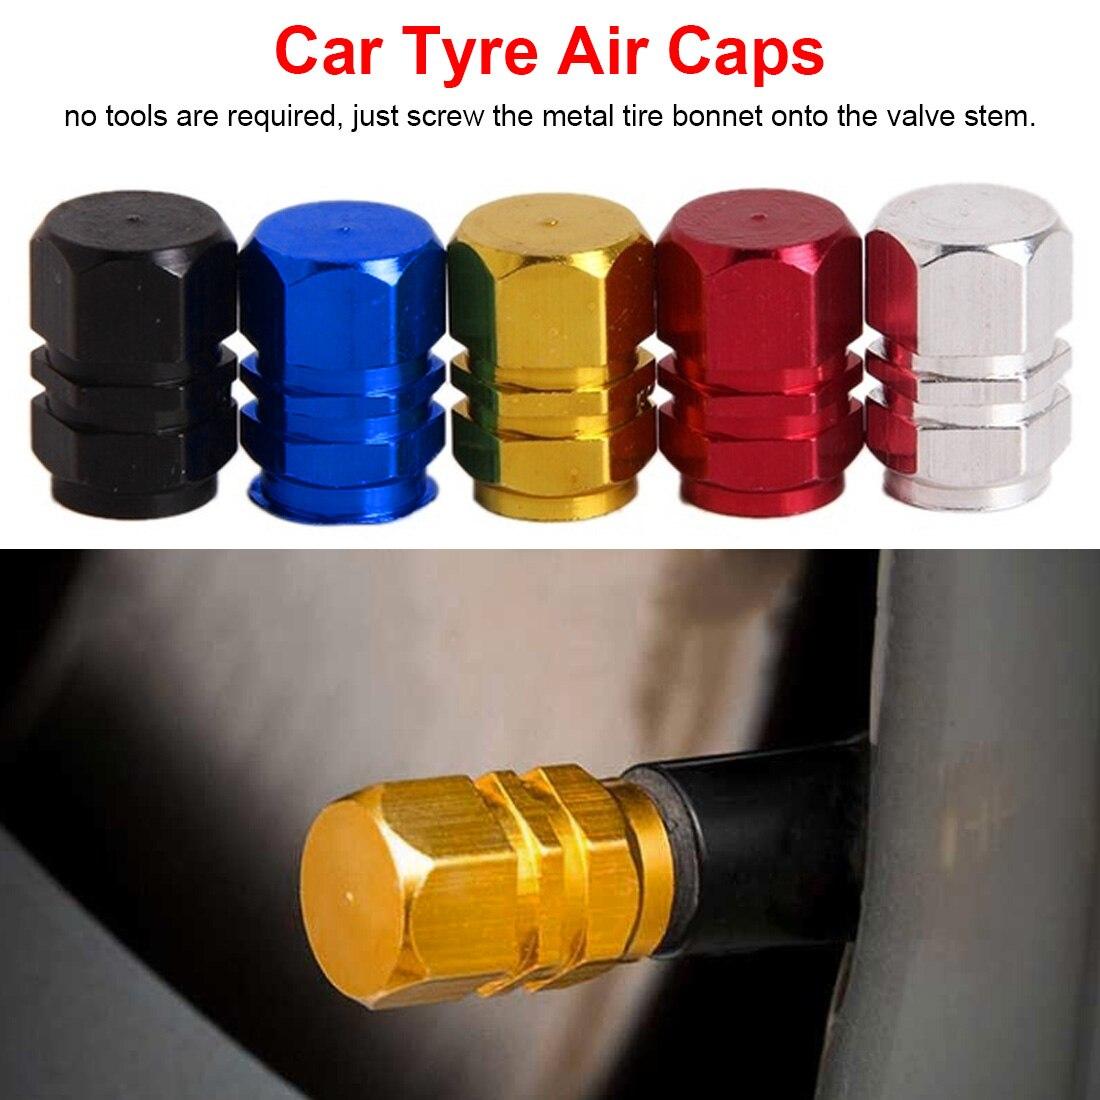 4pcs/Pack Black/Silver/Red/Gold/Blue Car Tire Valve Stem Caps Bolt-in Aluminum Theftproof Valve Caps Car Accessories